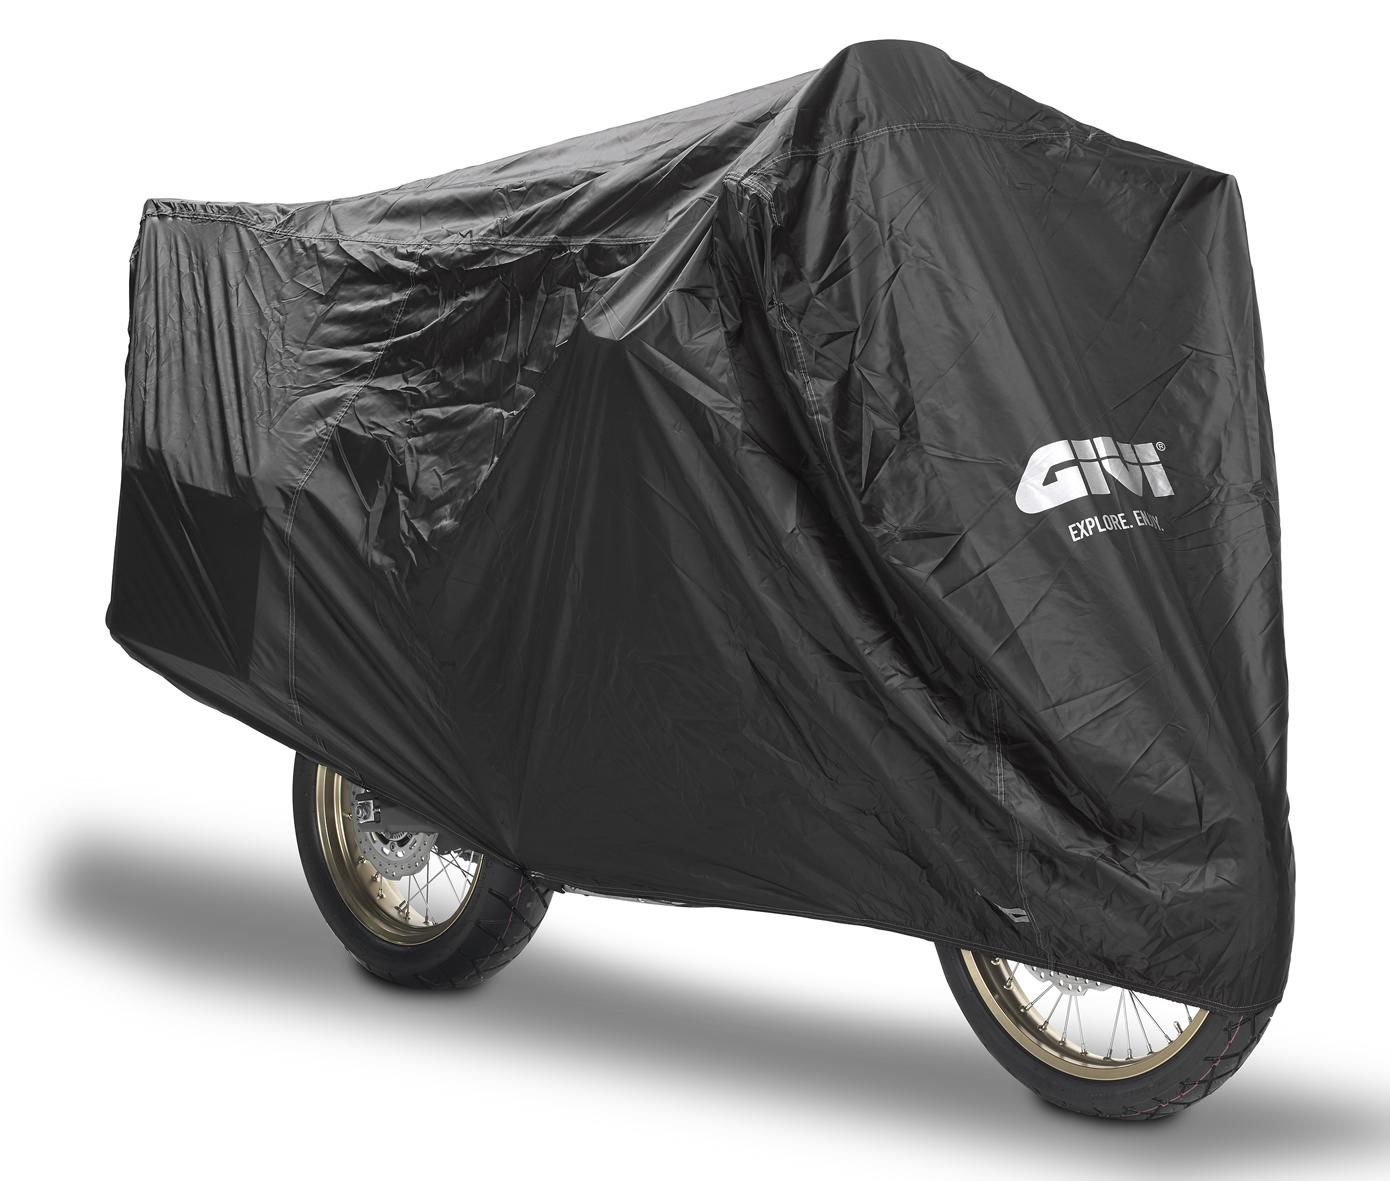 TG.XL TELO COPRIMOTO IMPERMEABILE FELPATO MOTO YAMAHA XVS 1100 A DRAGSTAR CLASSIC COPRI SCOOTER COVER